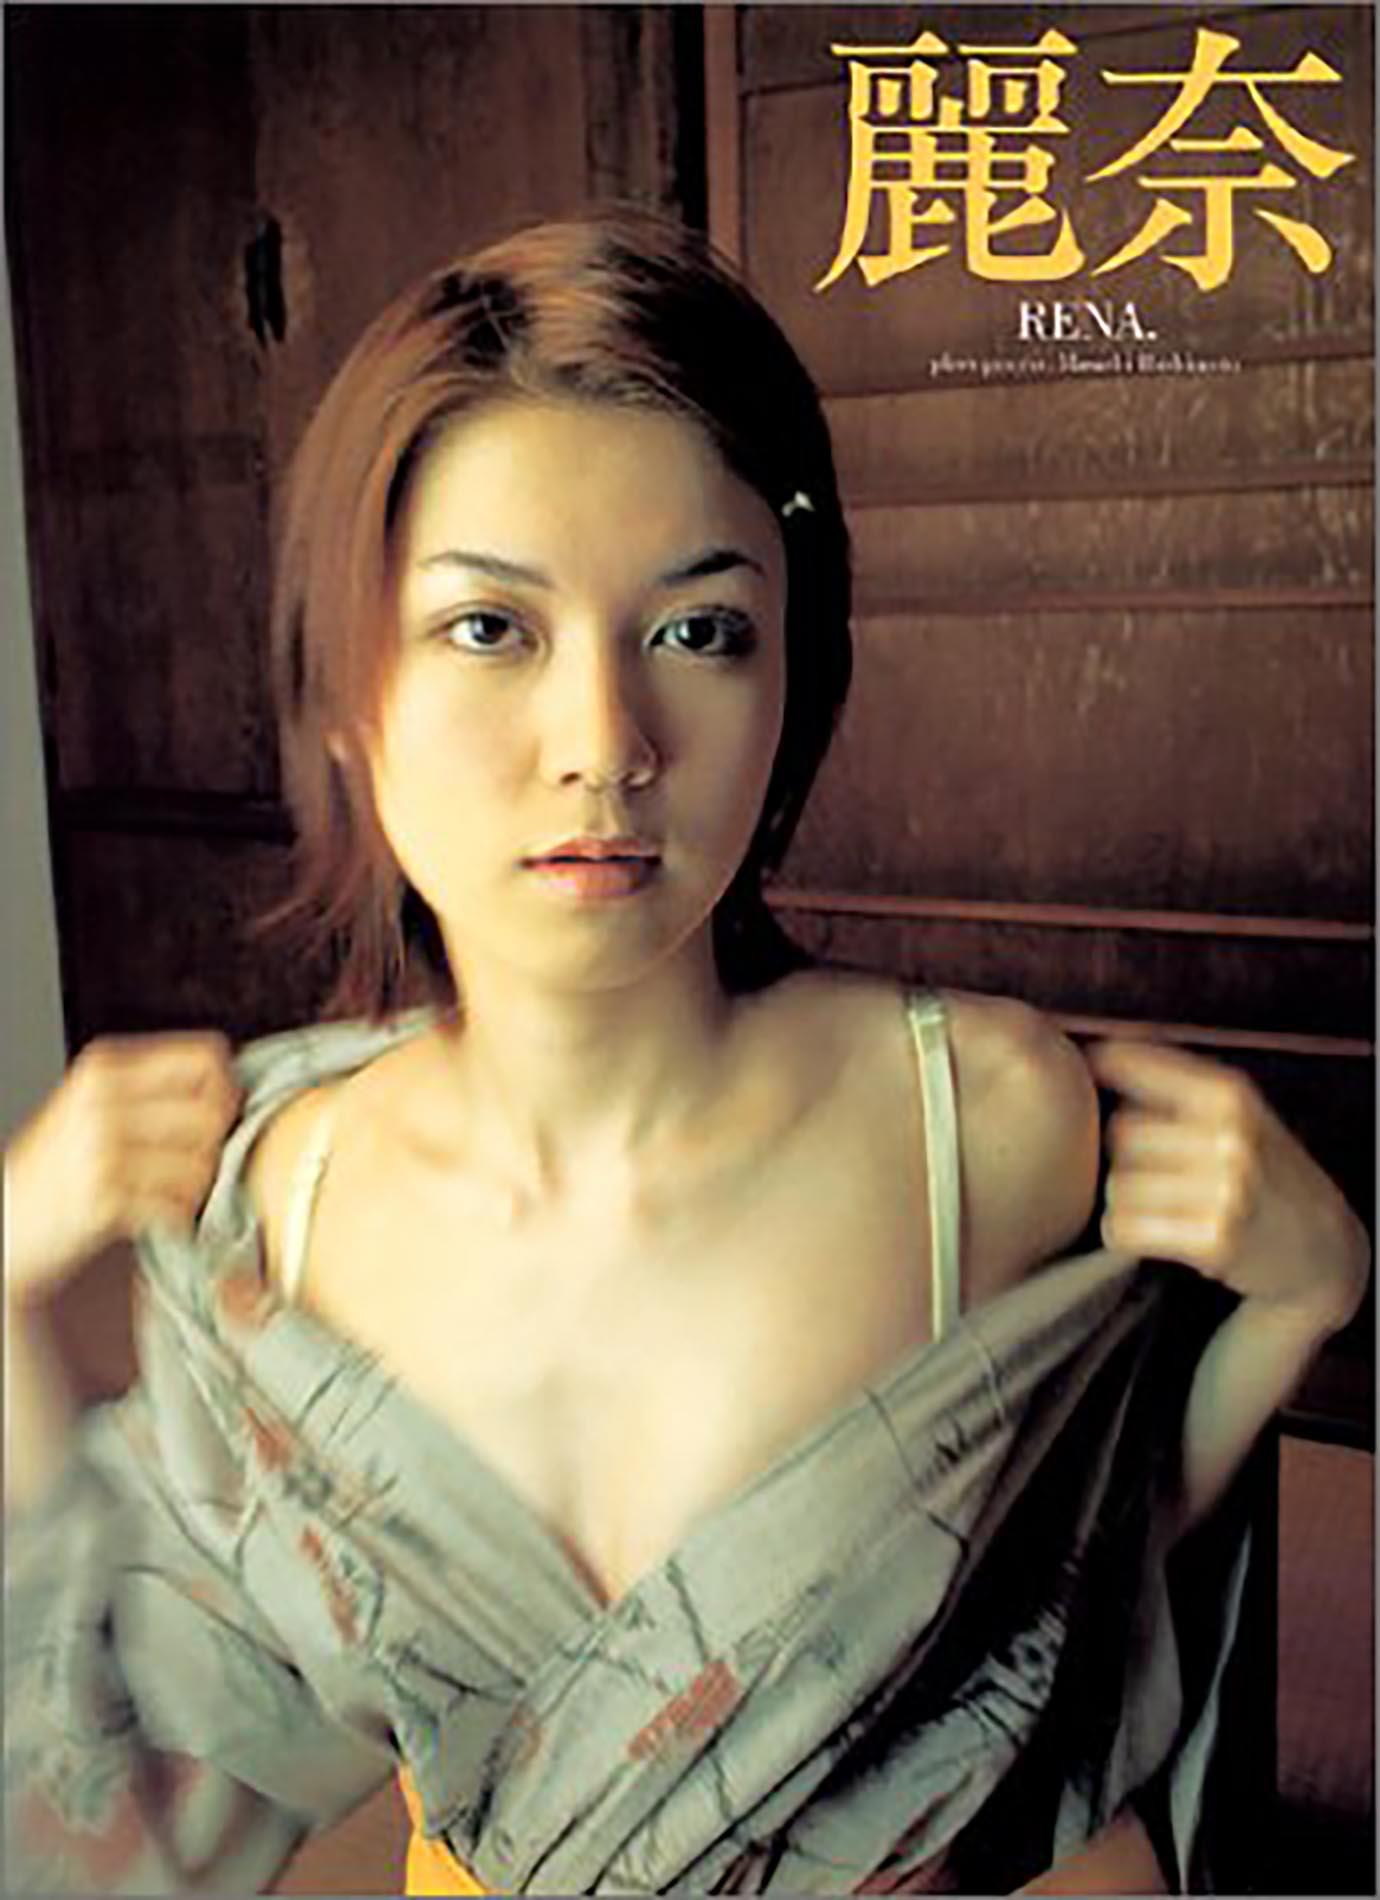 kat-tun-junnosuke-taguchi-komine-rena-taiho